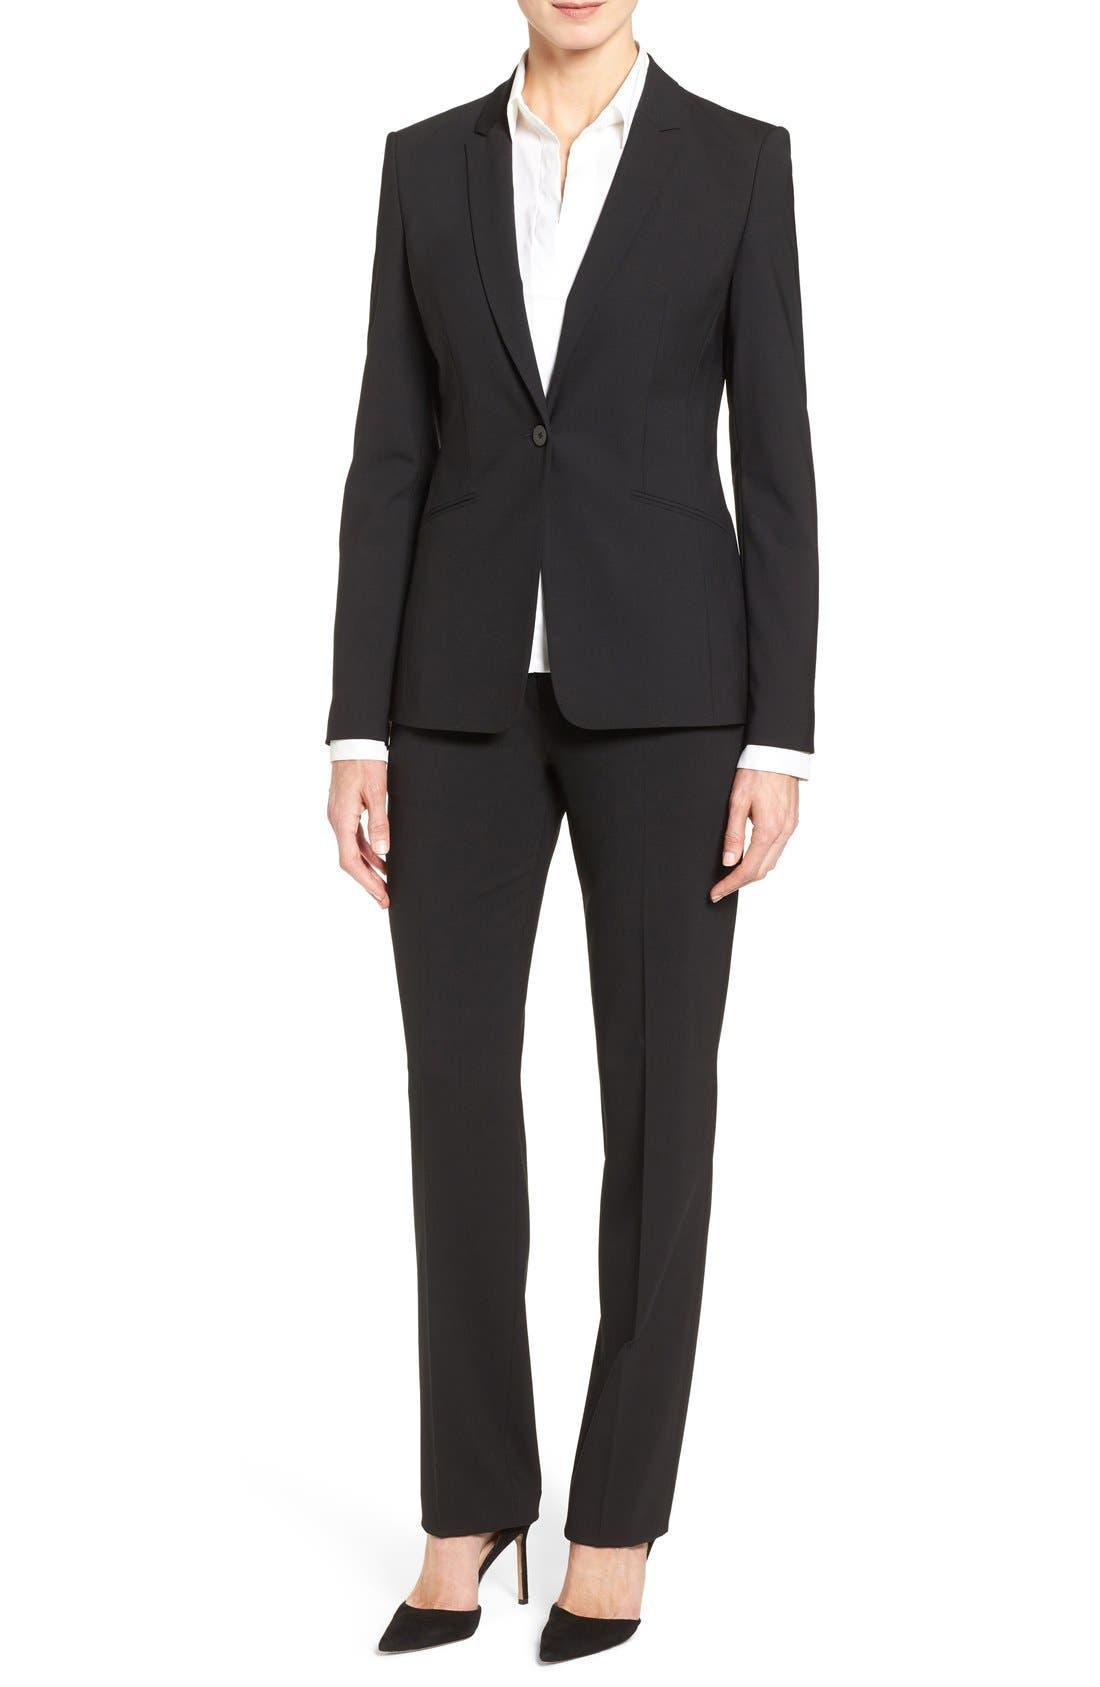 BOSS Suit Jacket, Straight Leg Trousers & Shirt